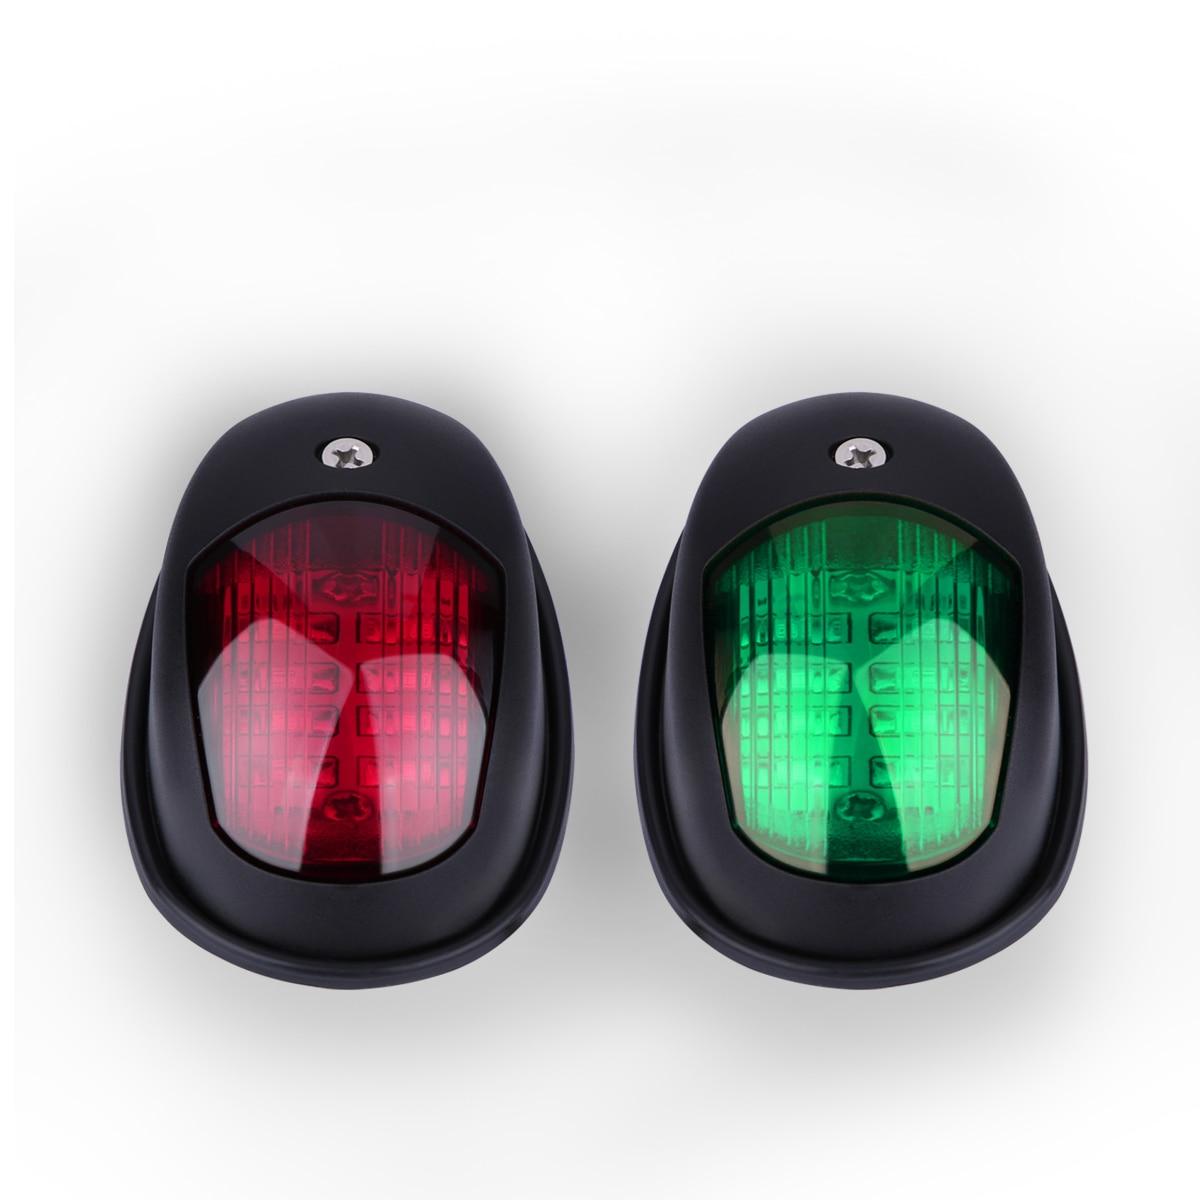 2pcs Dc 12 24v Navigation Light Green And Red Marine Led